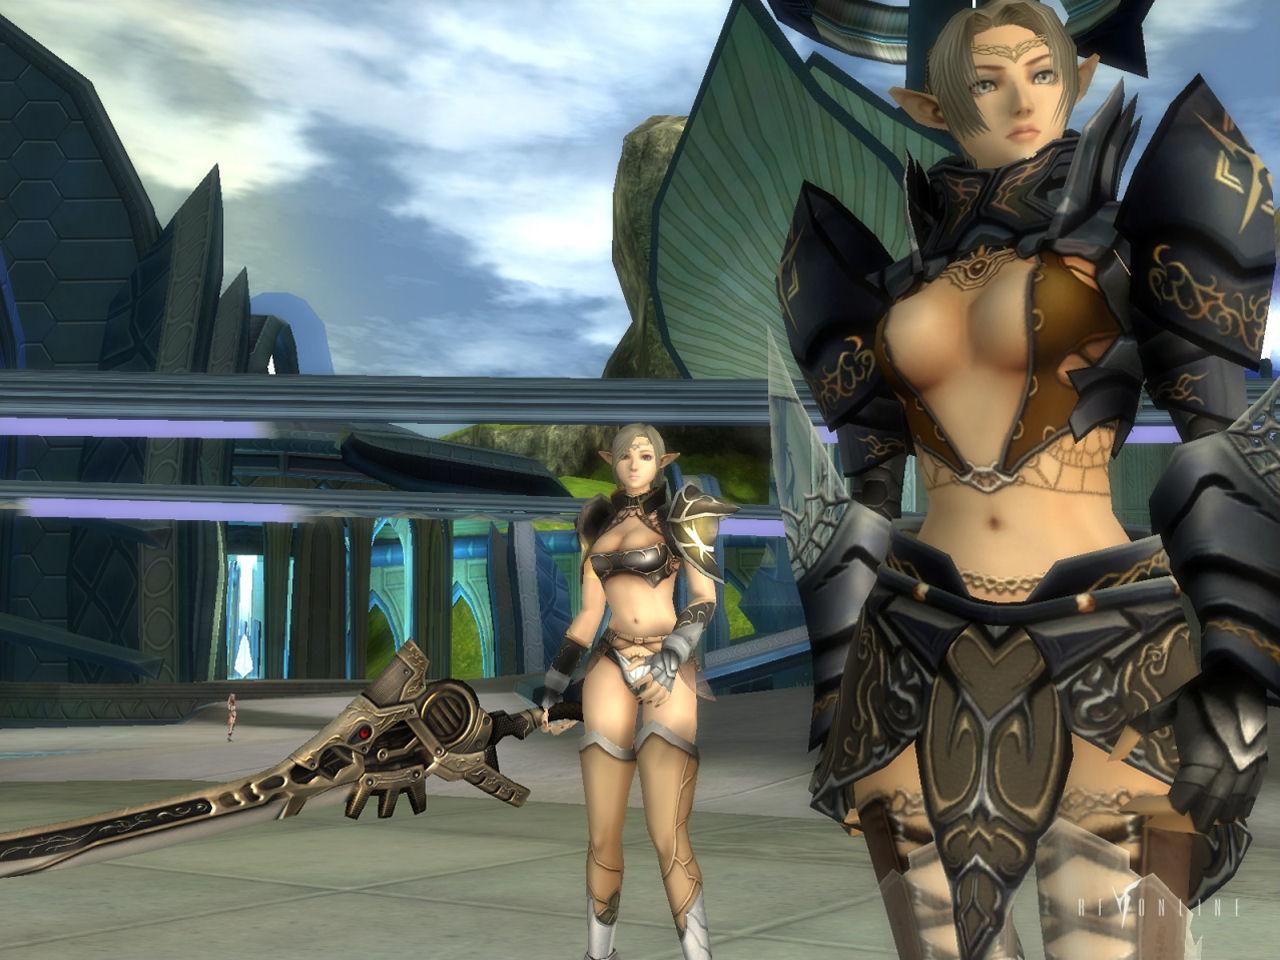 Rf online nude erotic pic